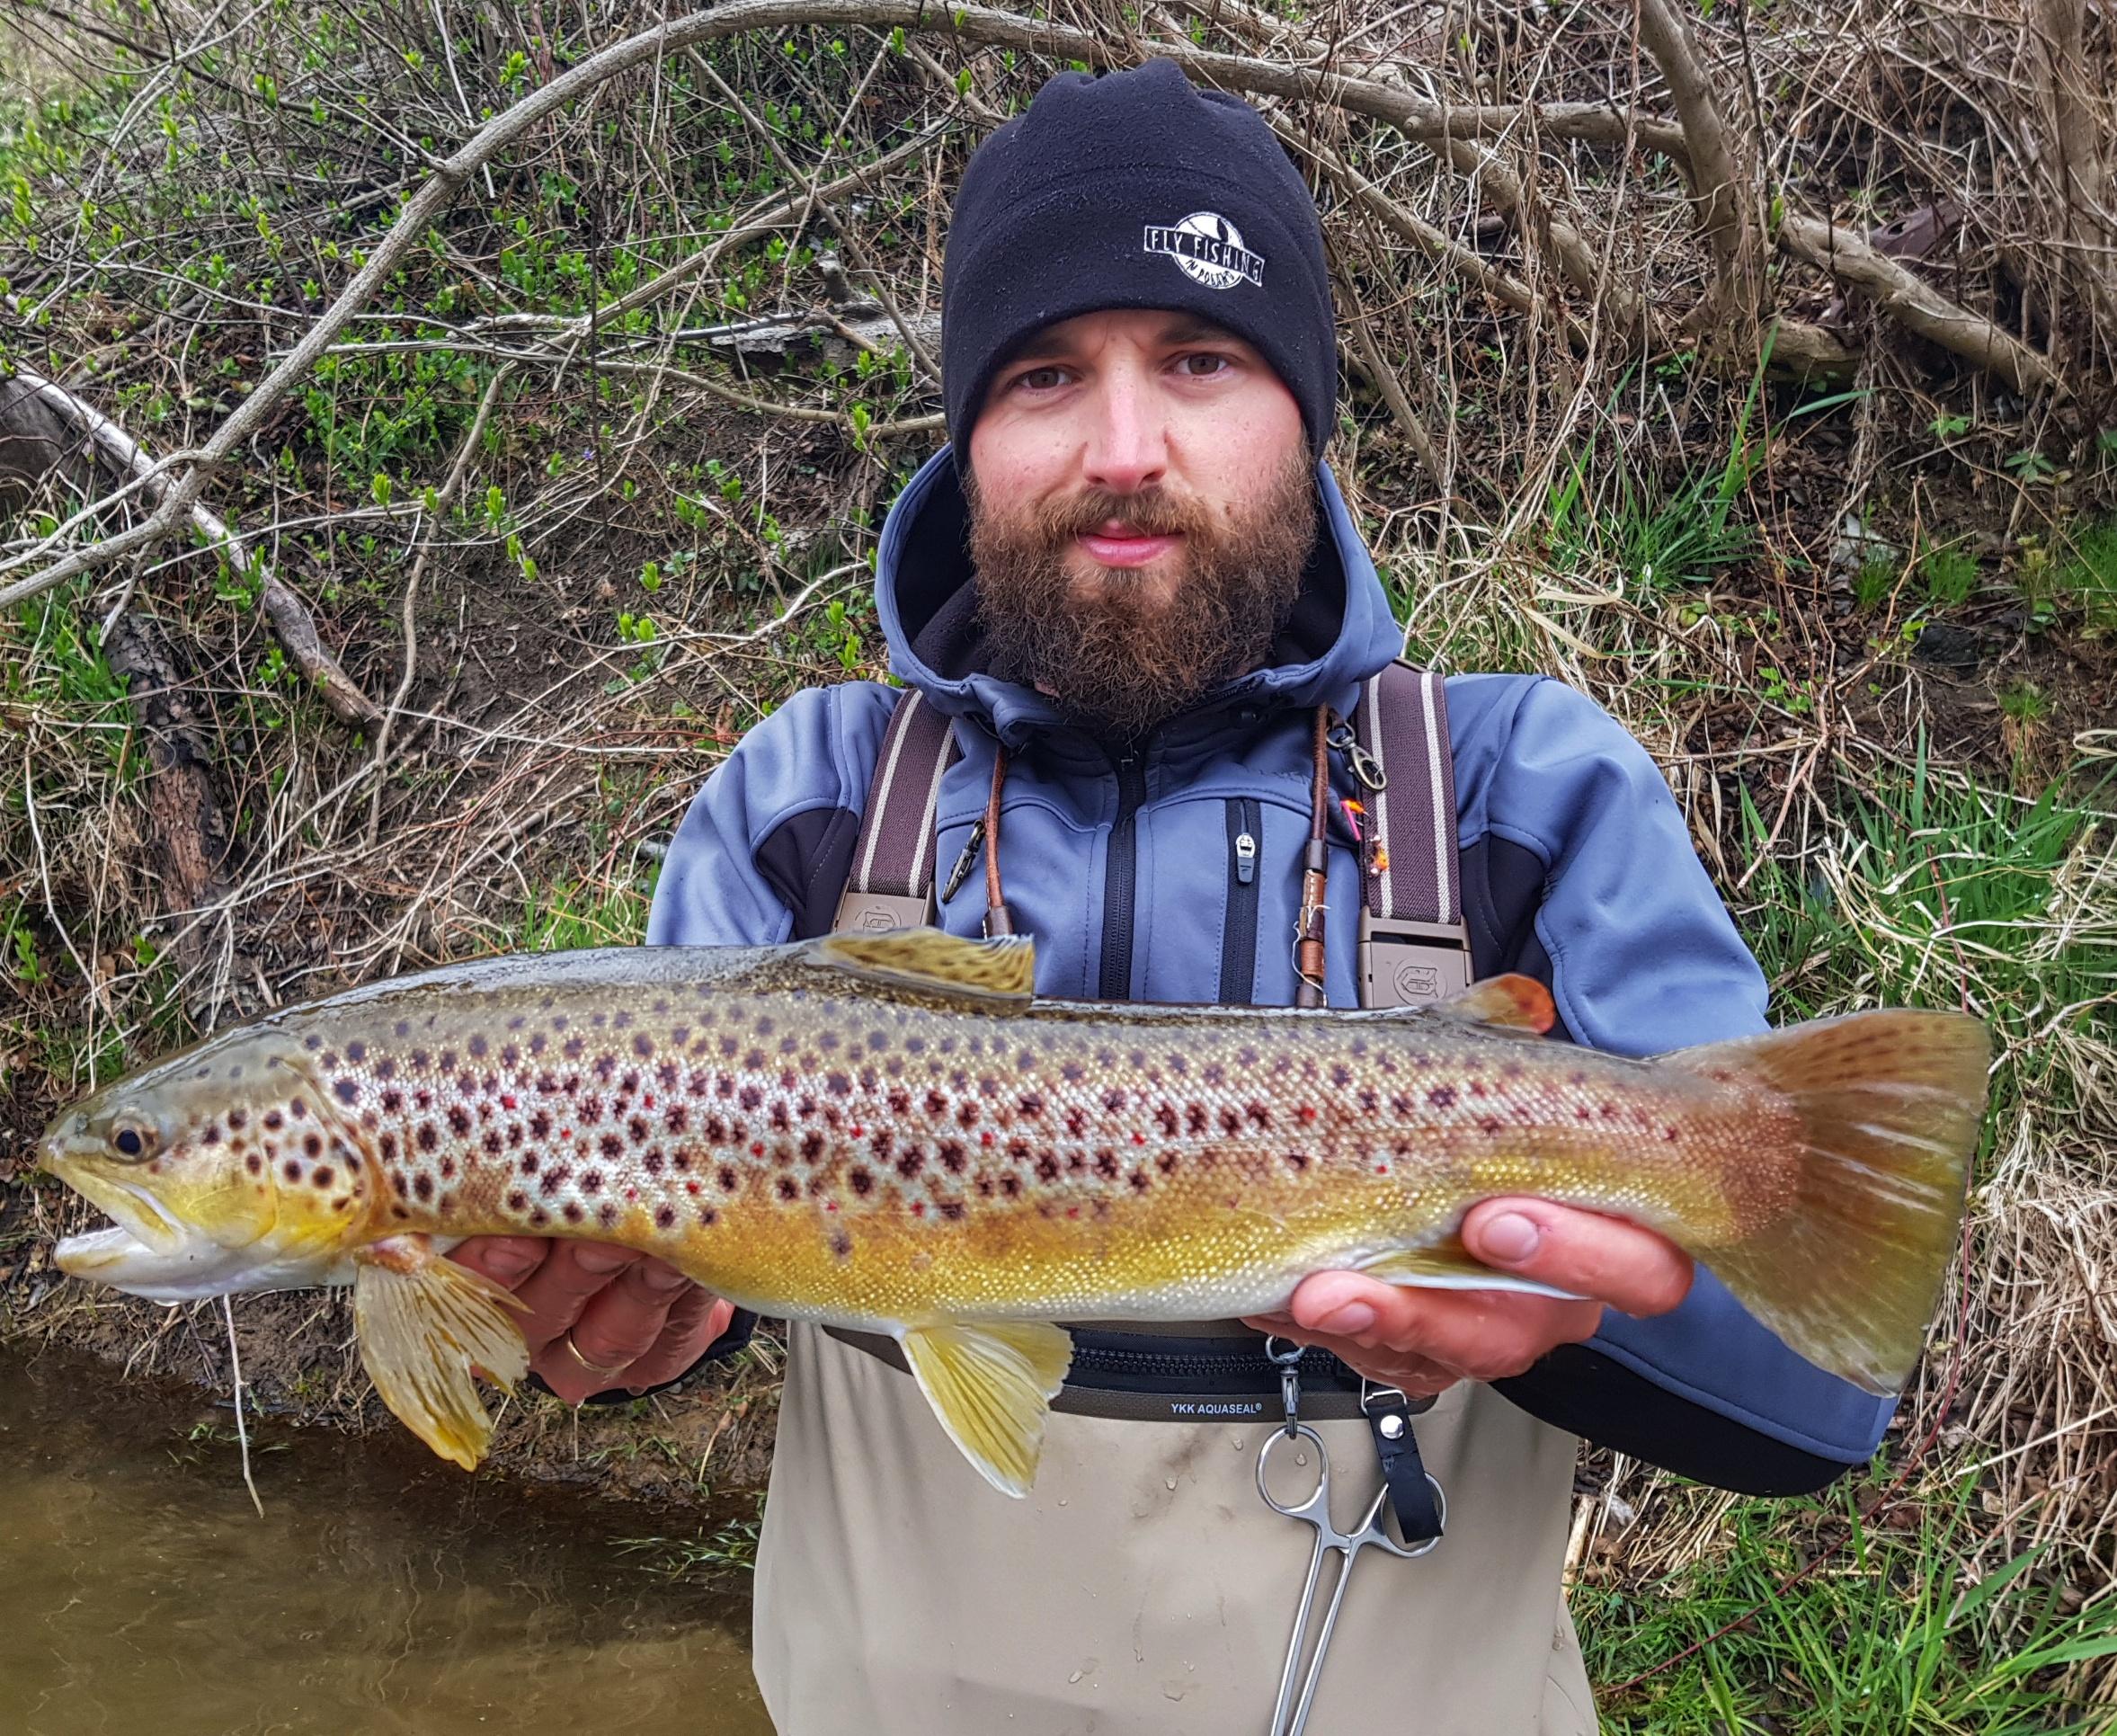 streamer light fishing Dunajec River - Poland fishing trips